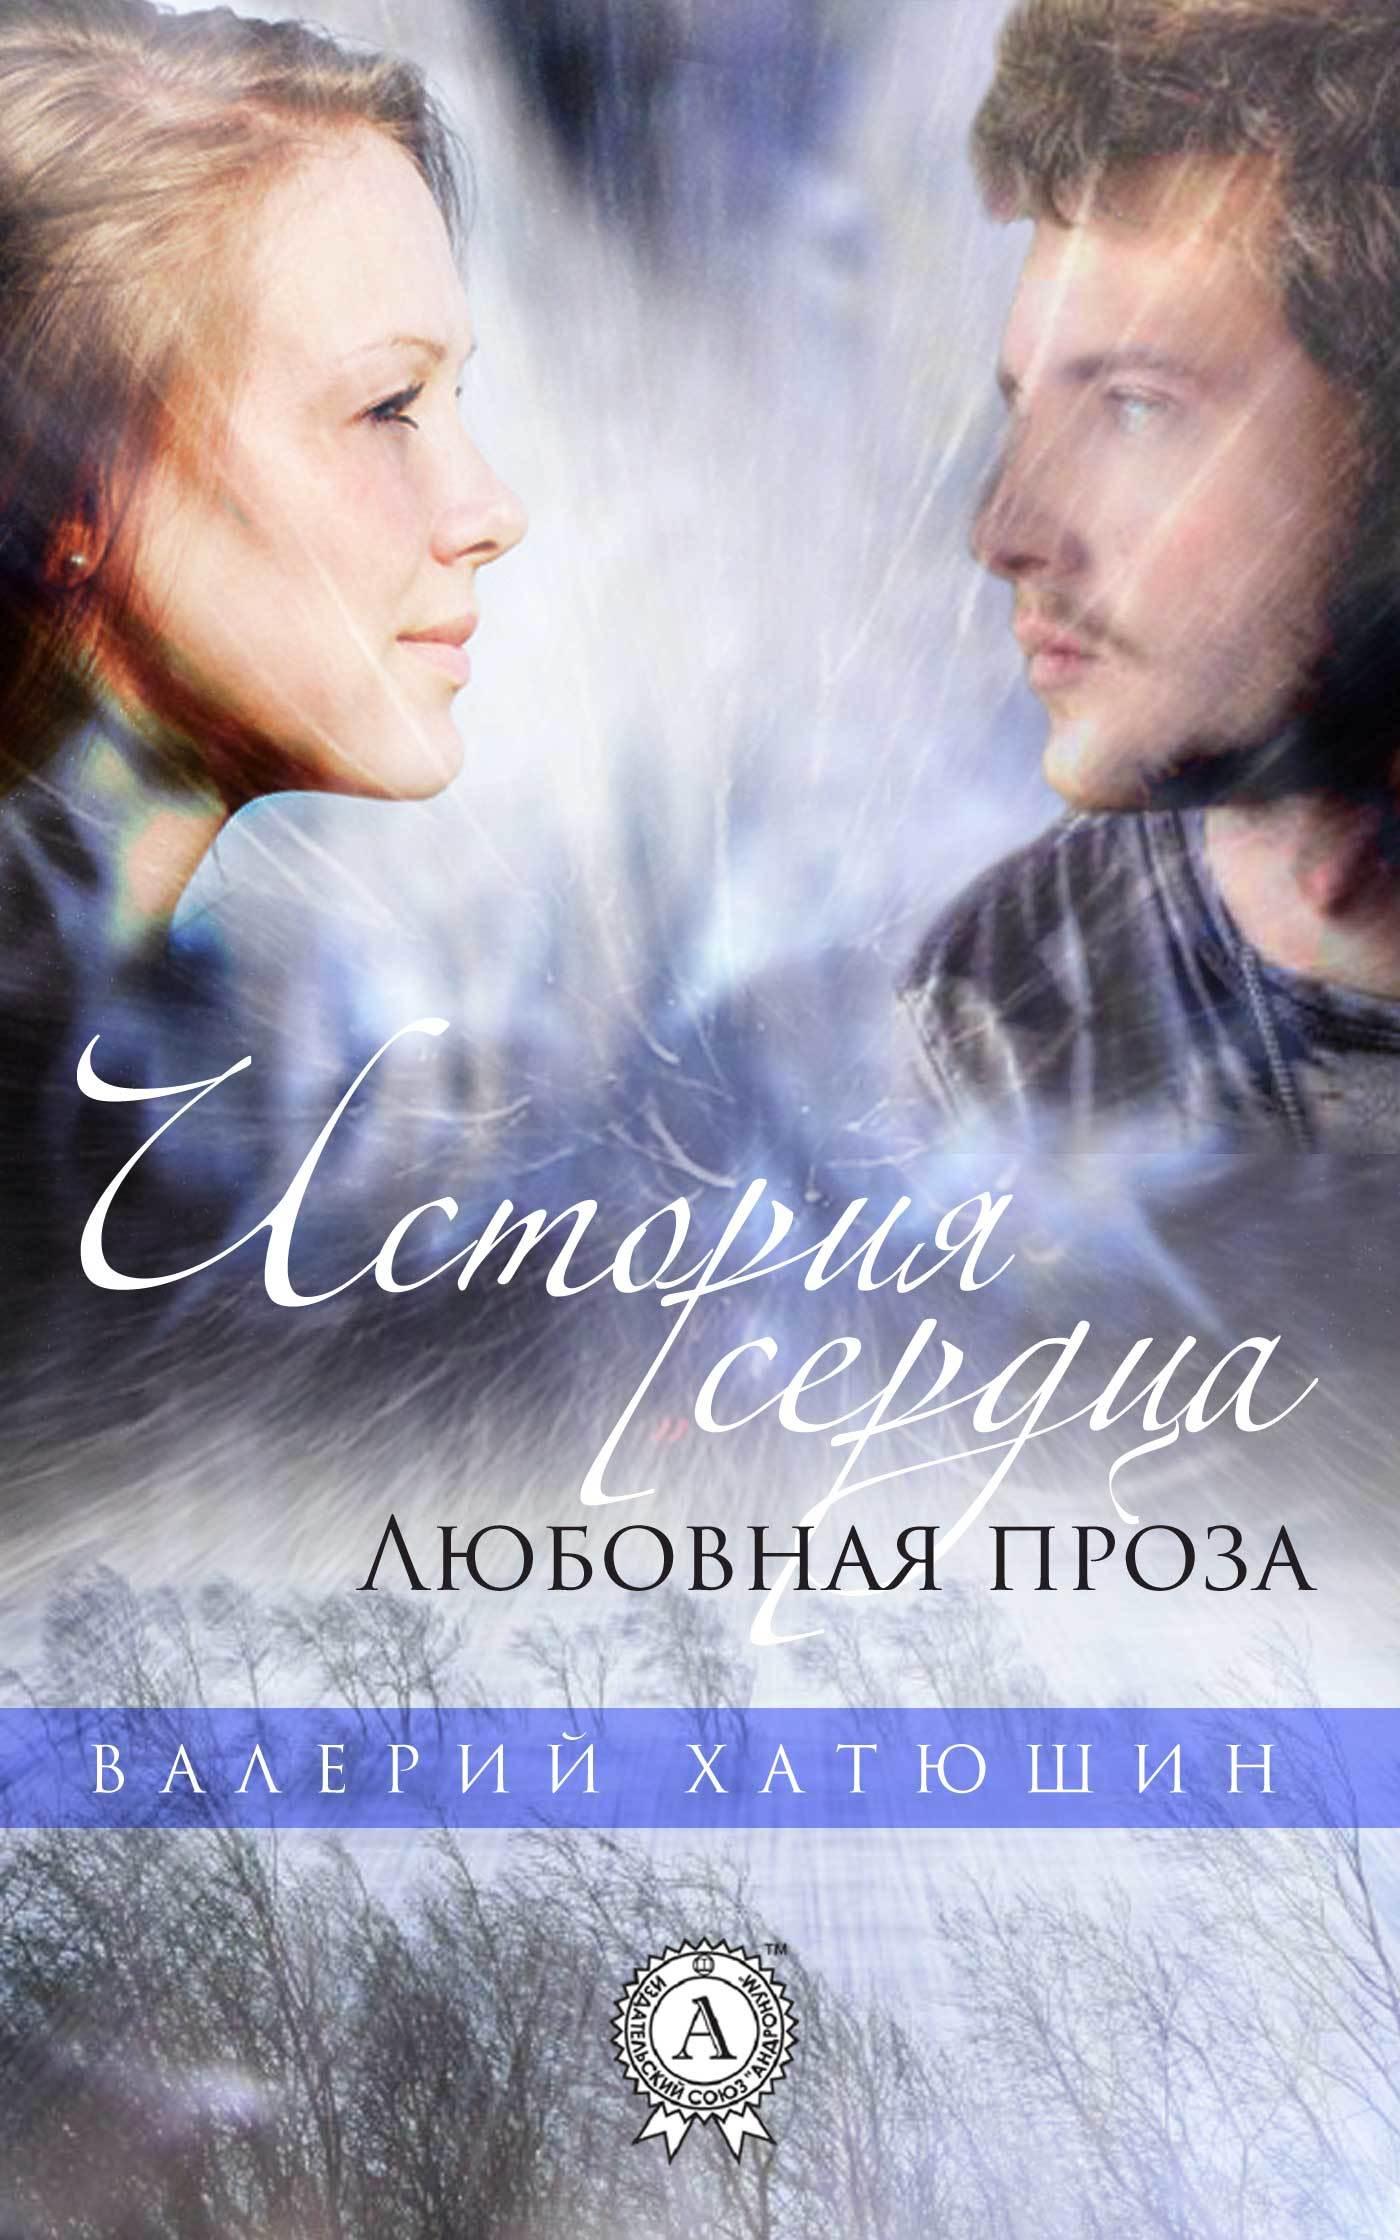 Валерий Хатюшин История сердца. Любовная проза валерий хатюшин история сердца любовная проза